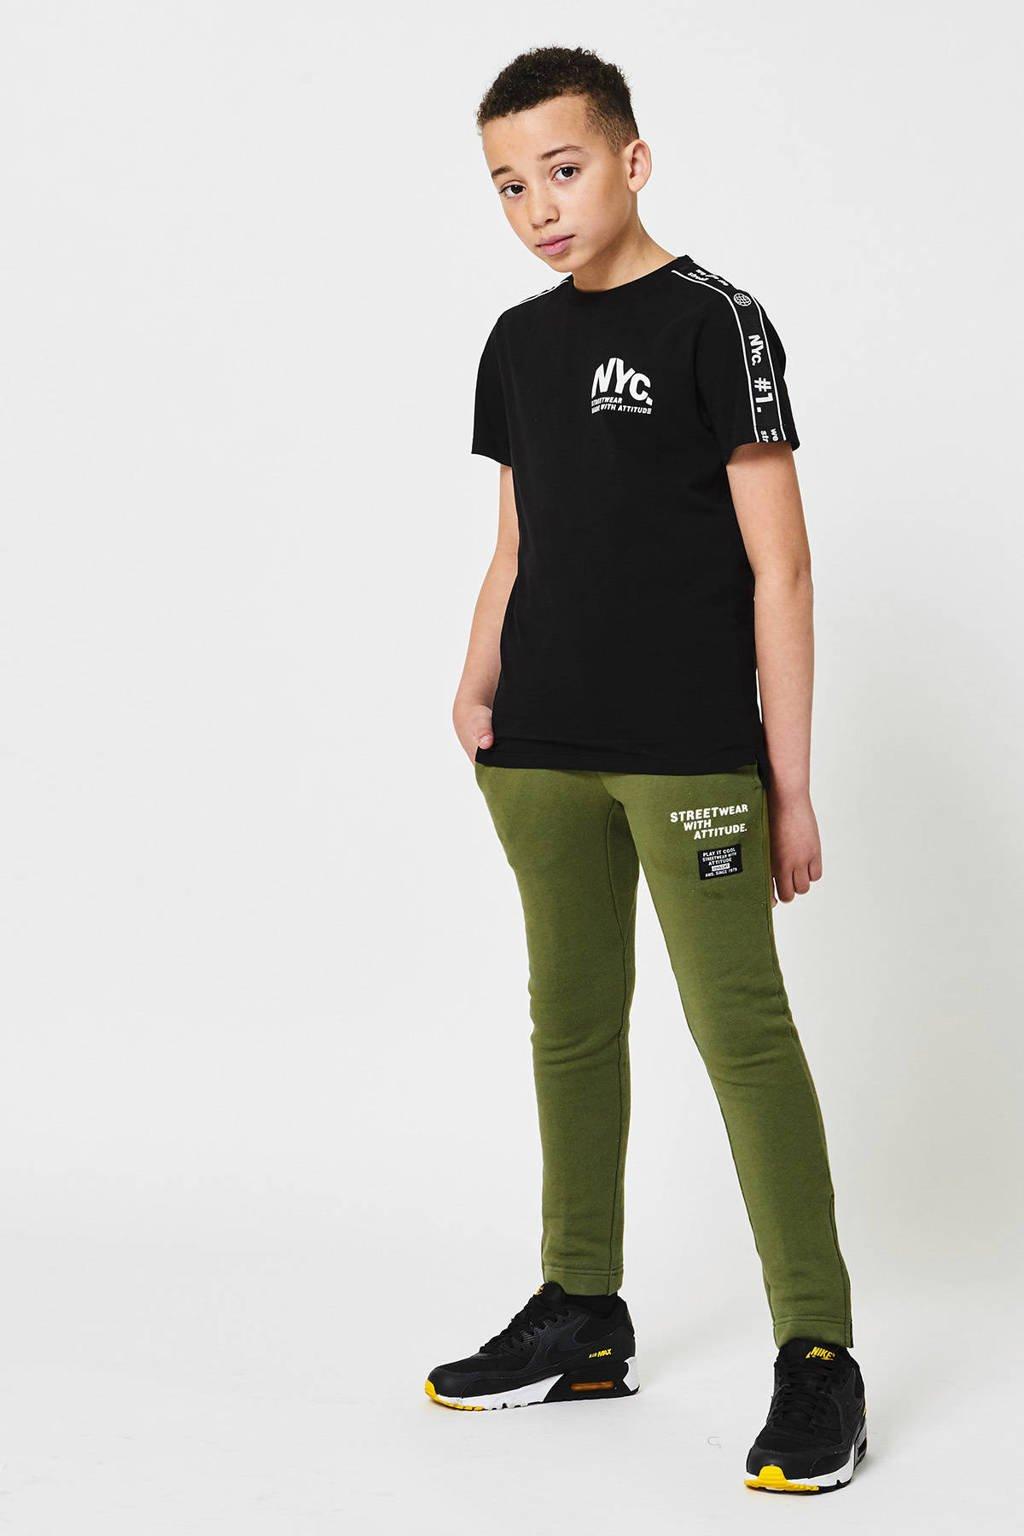 CoolCat Junior joggingbroek Caz met tekst army groen, Army groen